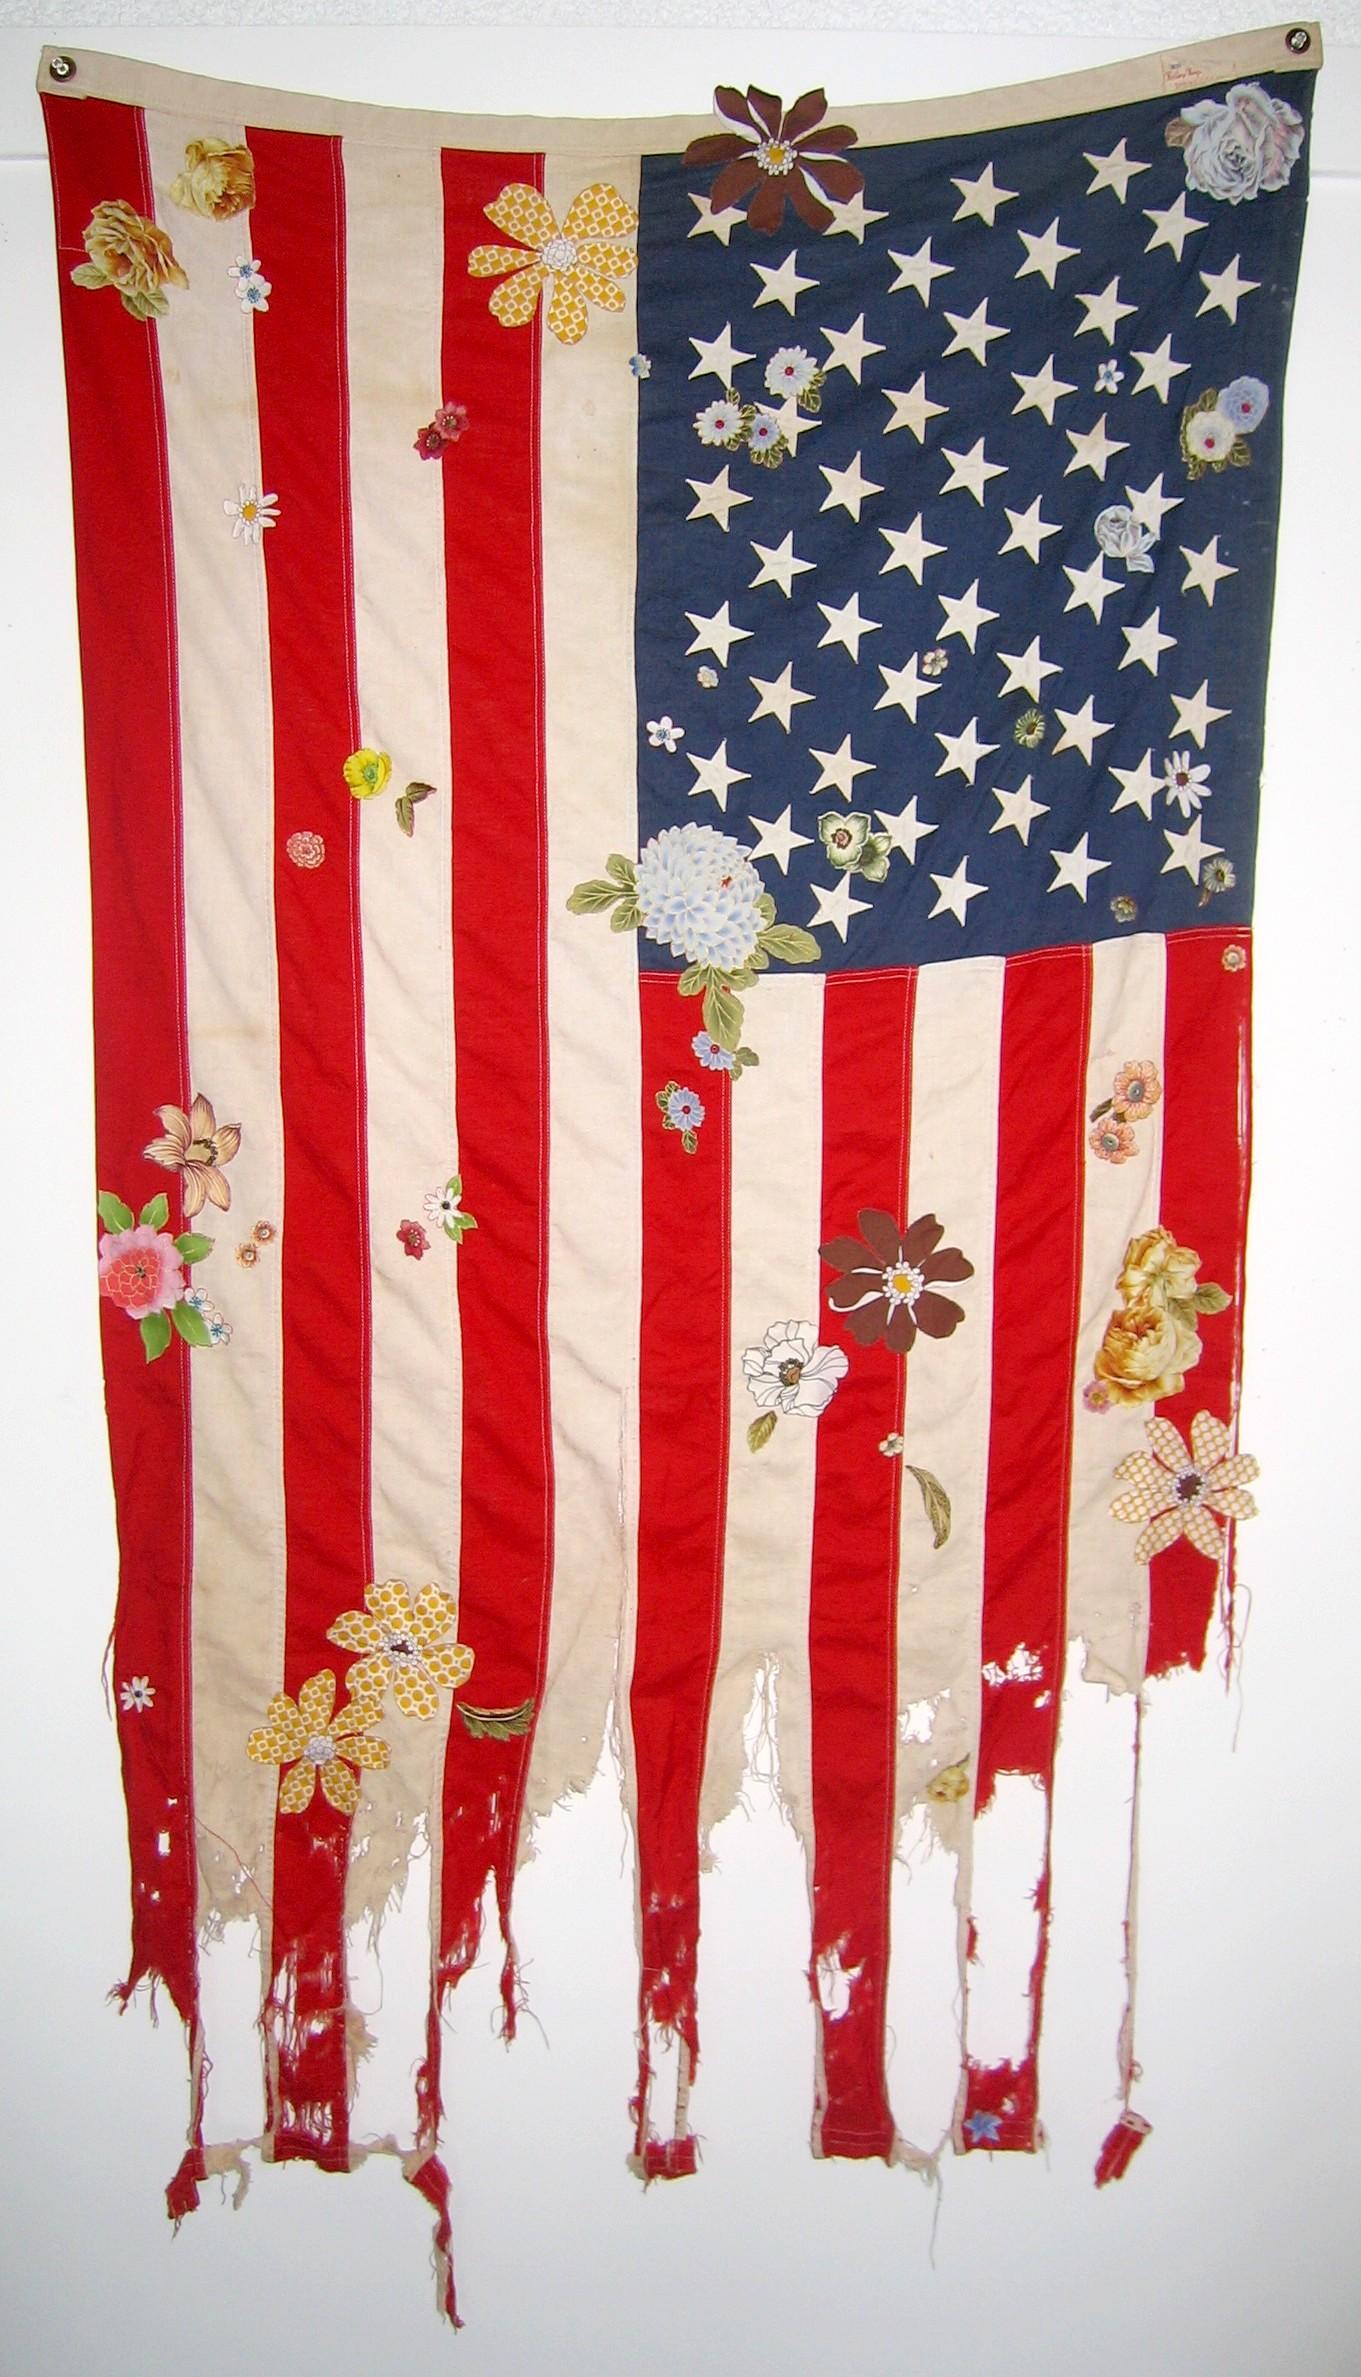 America the Beautified (2005)